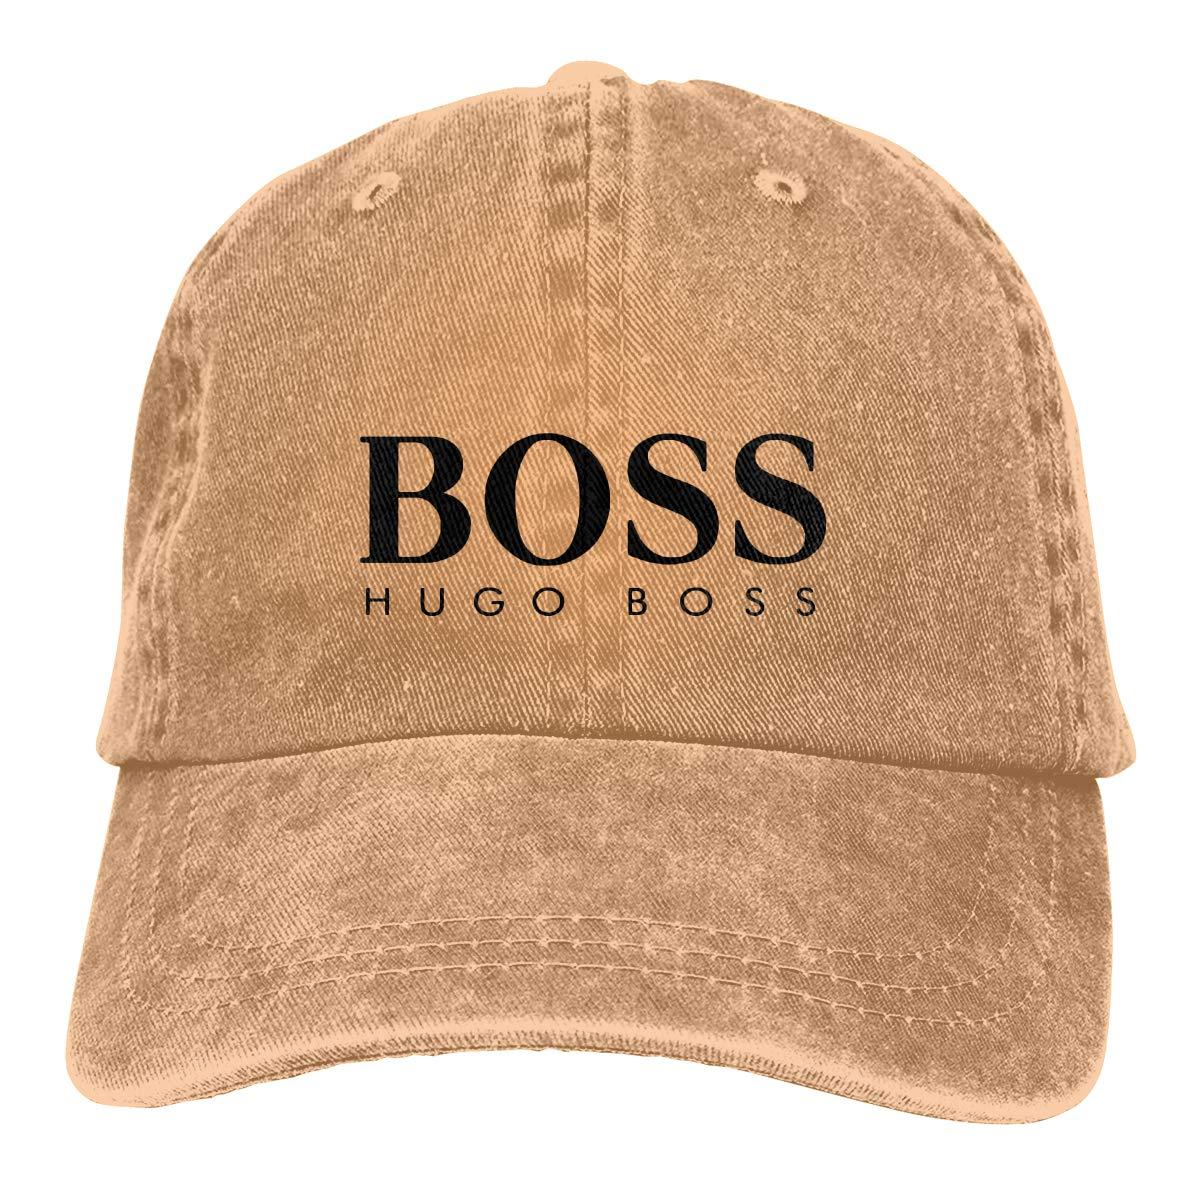 Gorras de béisbol Unisex Boss Hugo Boss, Estilo Vintage, lavadas ...